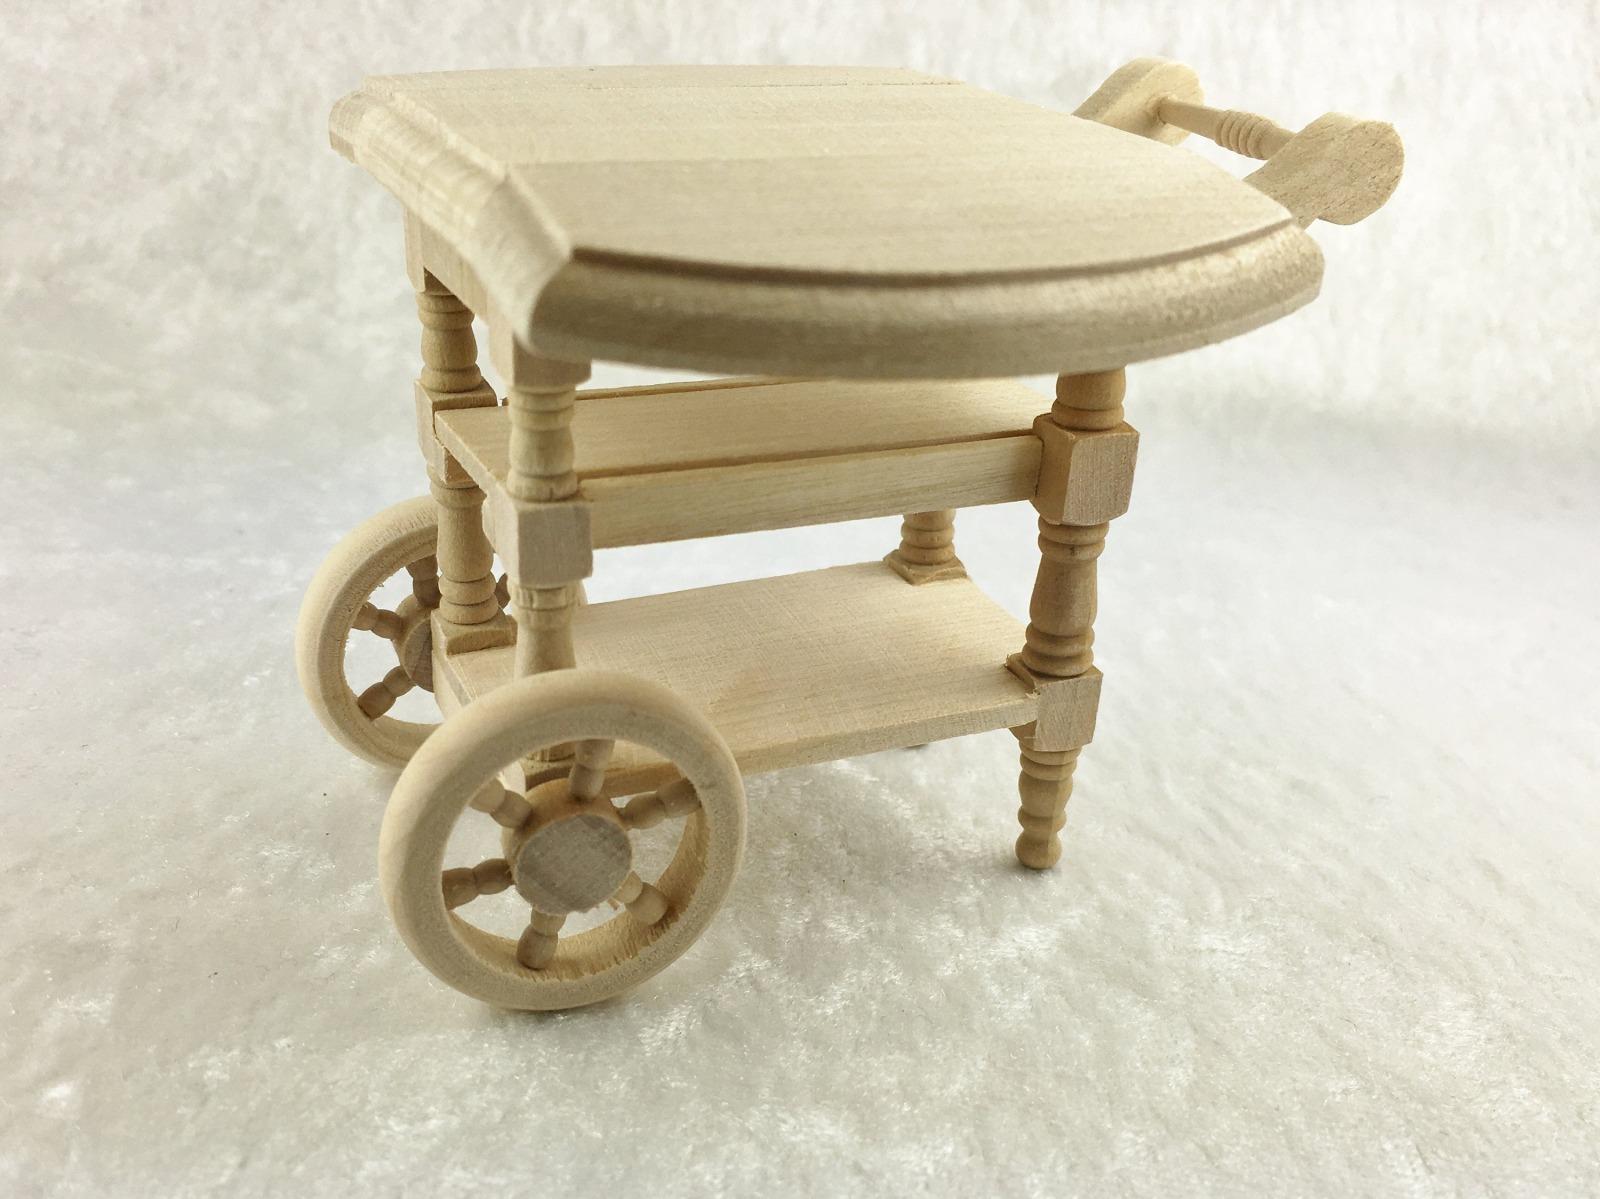 Teewagen 1:12 Miniatur 3